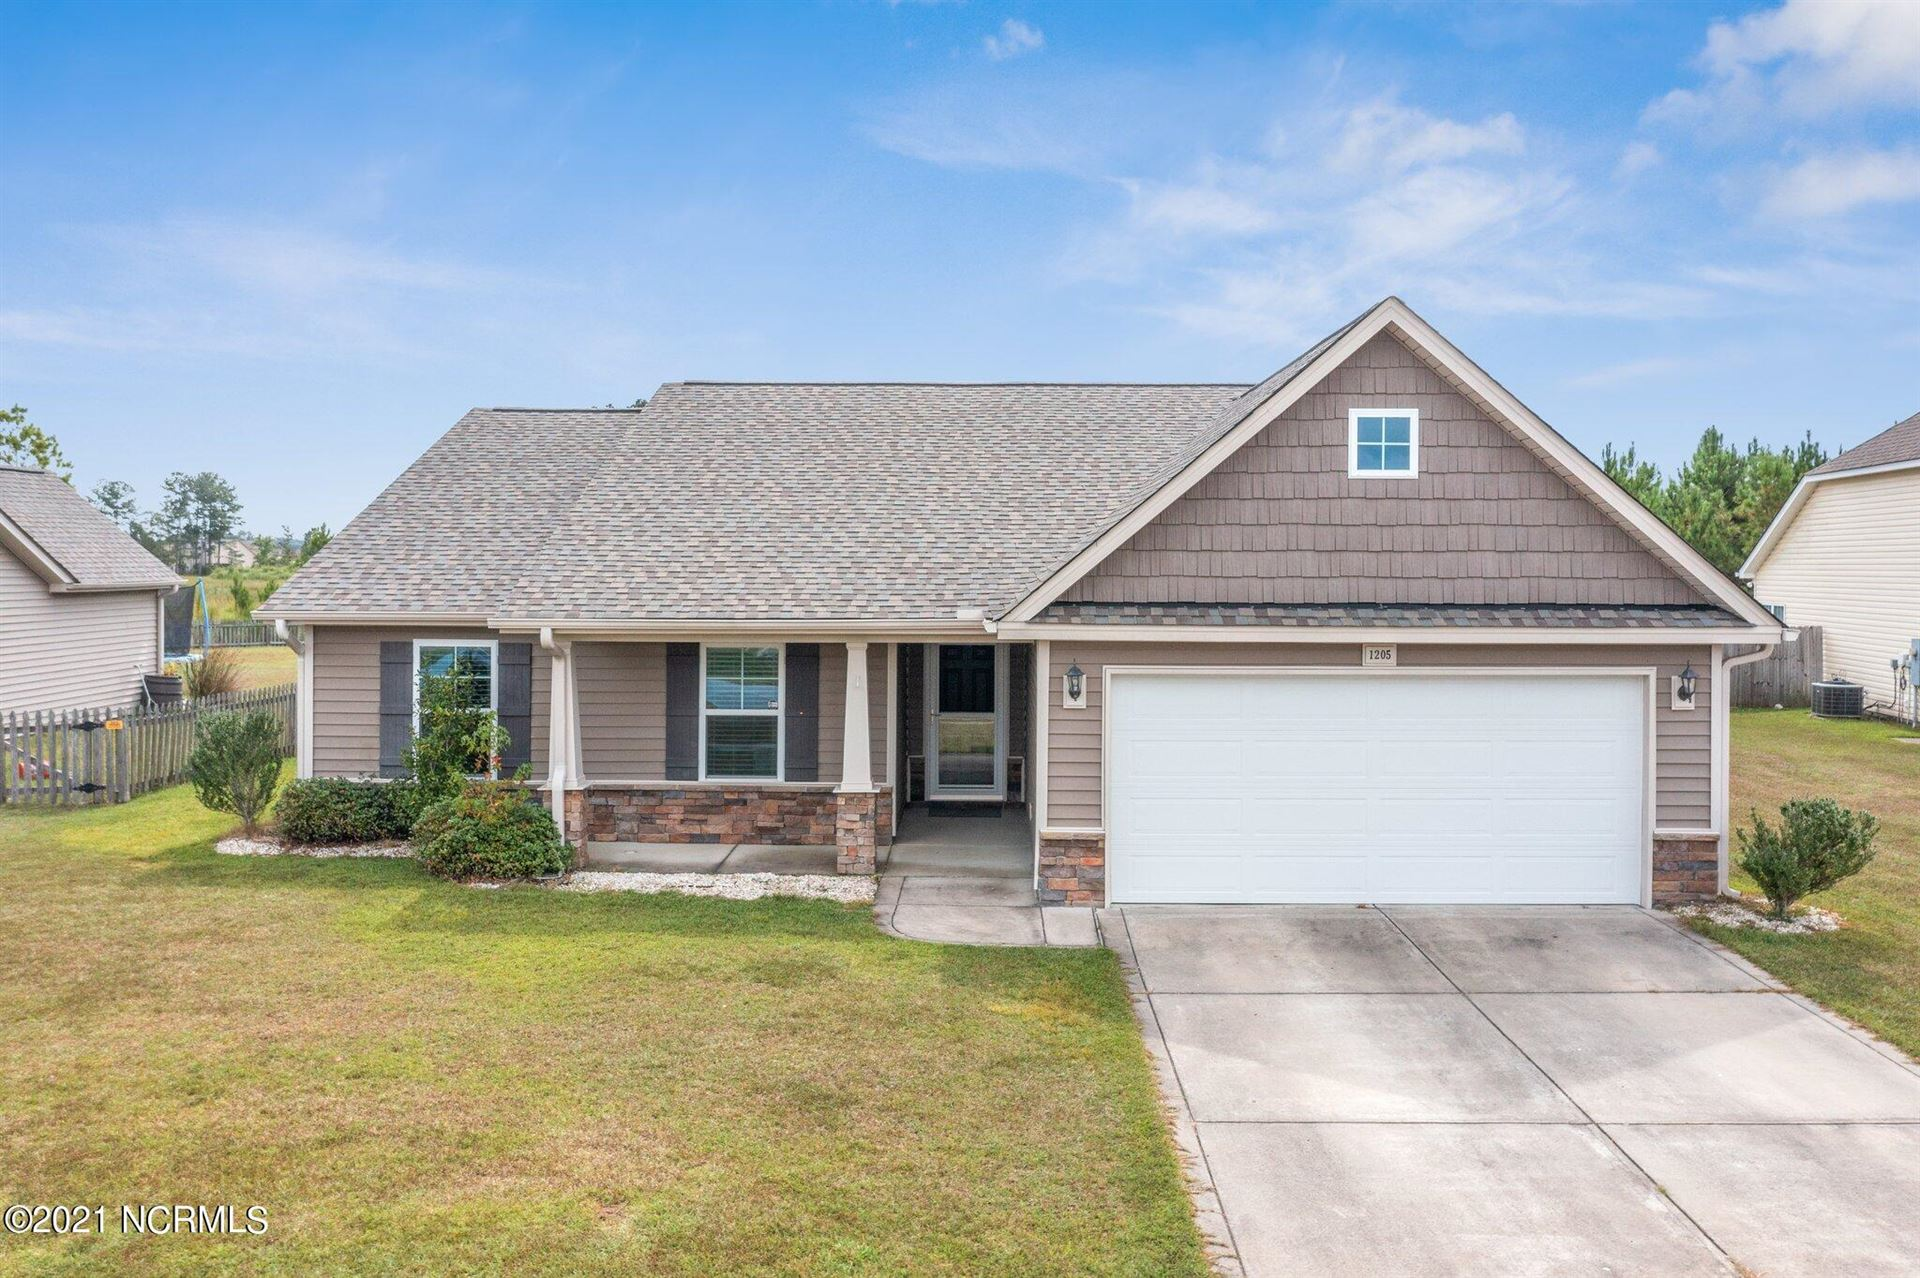 Photo of 1205 Teakwood Drive, Greenville, NC 27834 (MLS # 100291922)